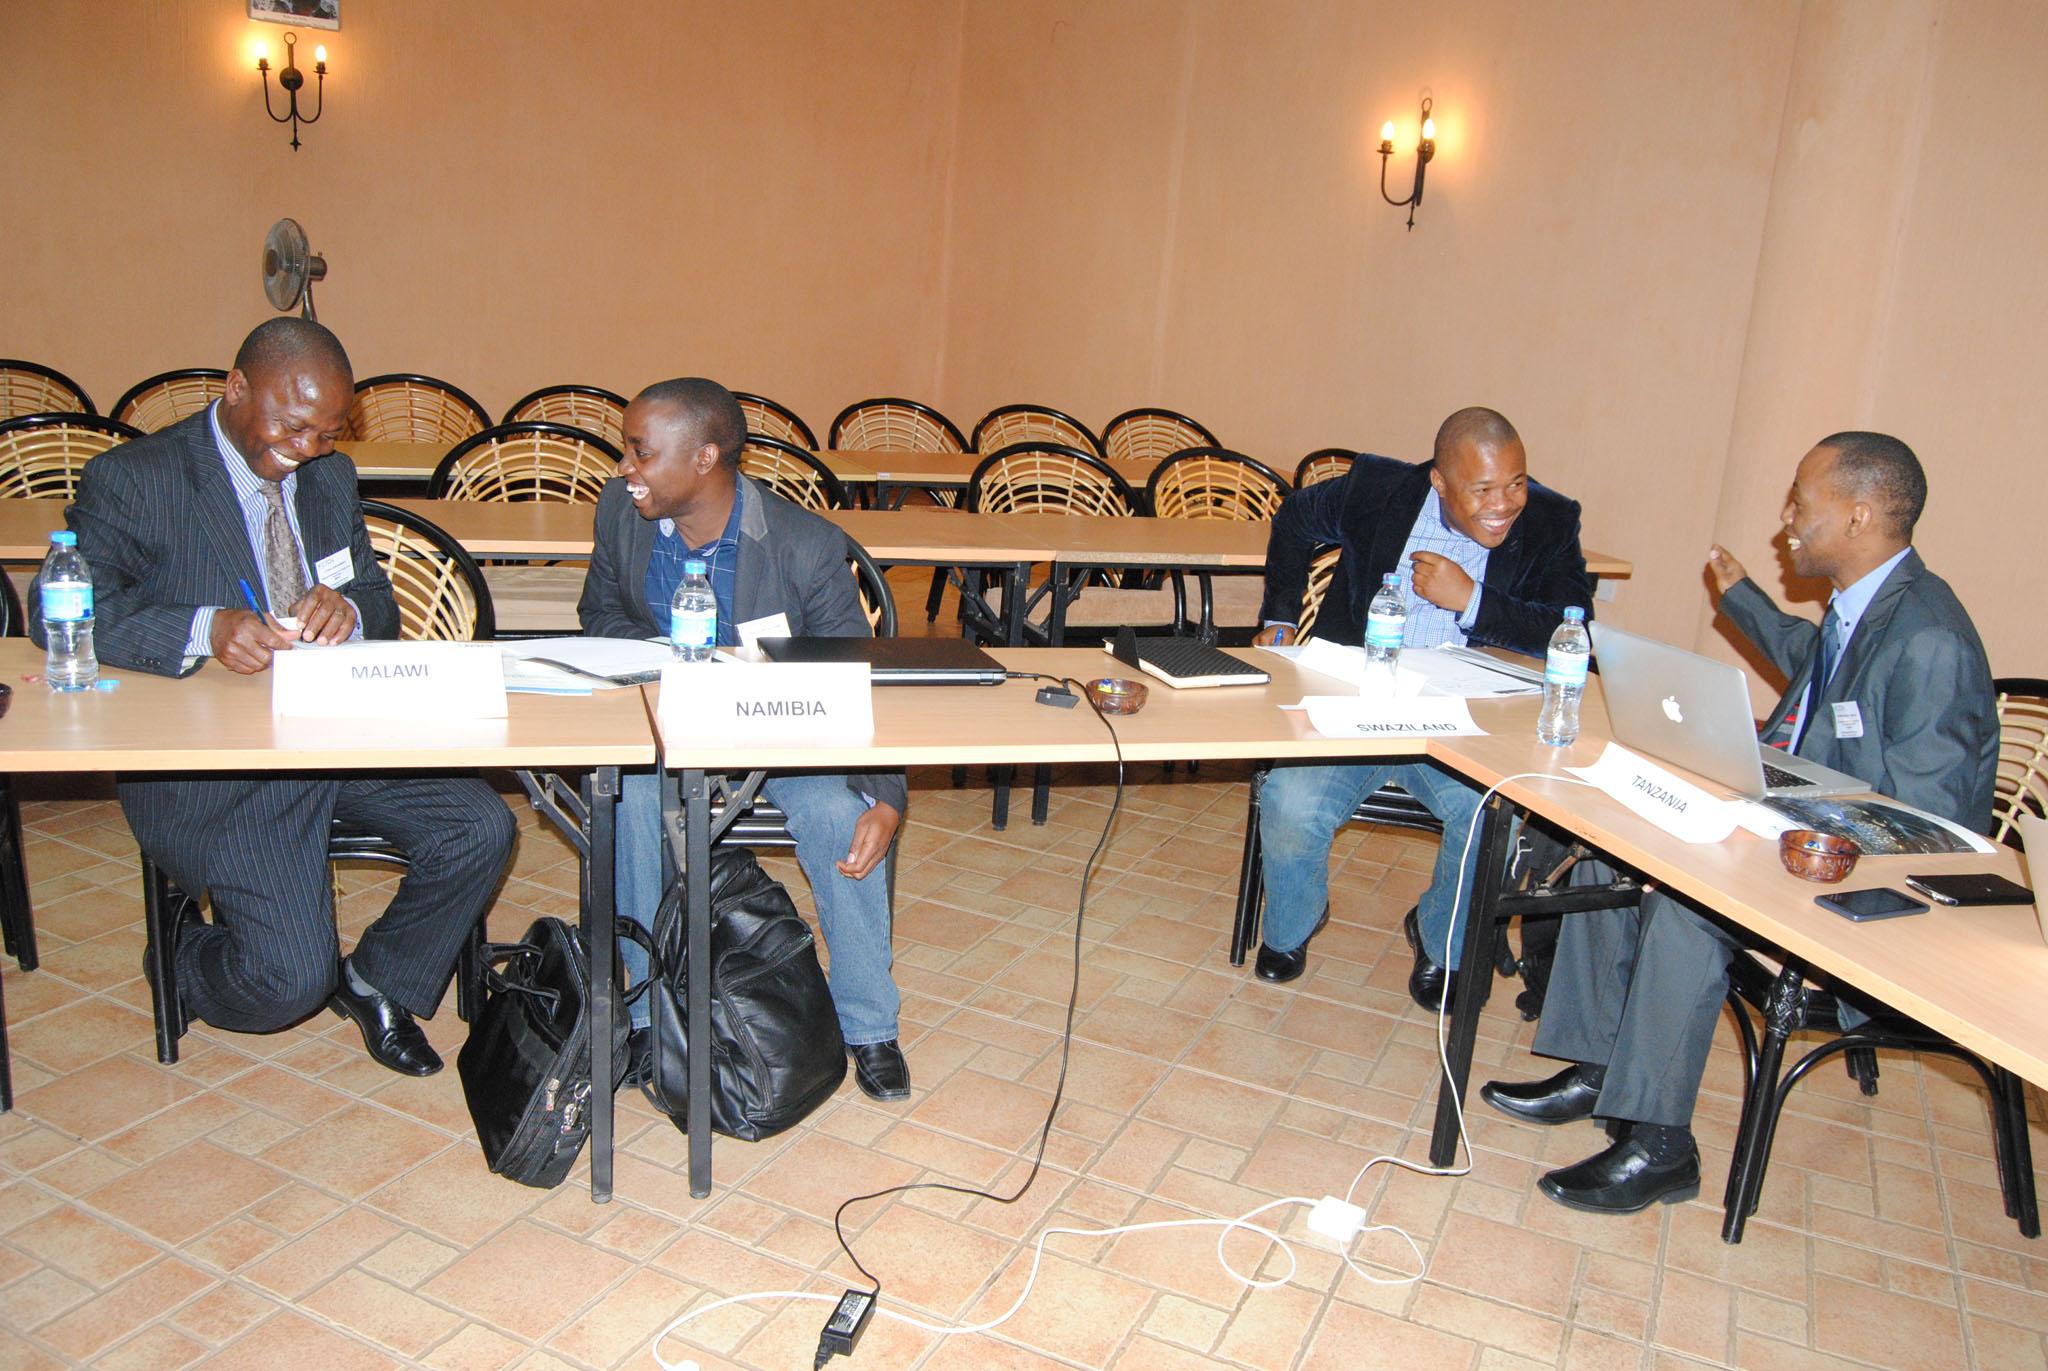 Regional NDE Forum Tanzania026.jpg